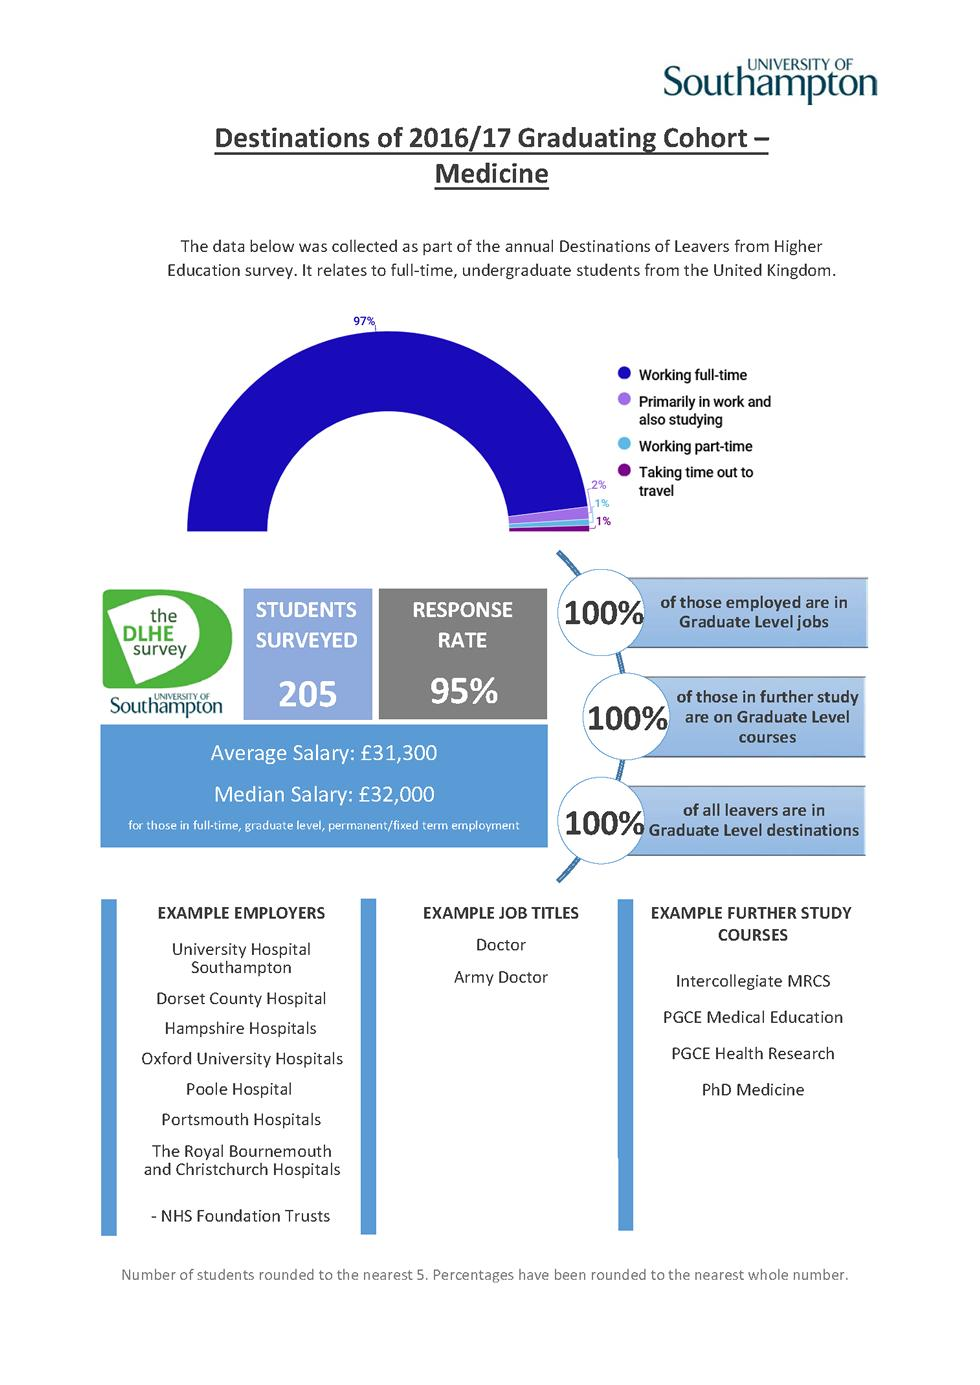 Medicine DLHE Survey 2016-17